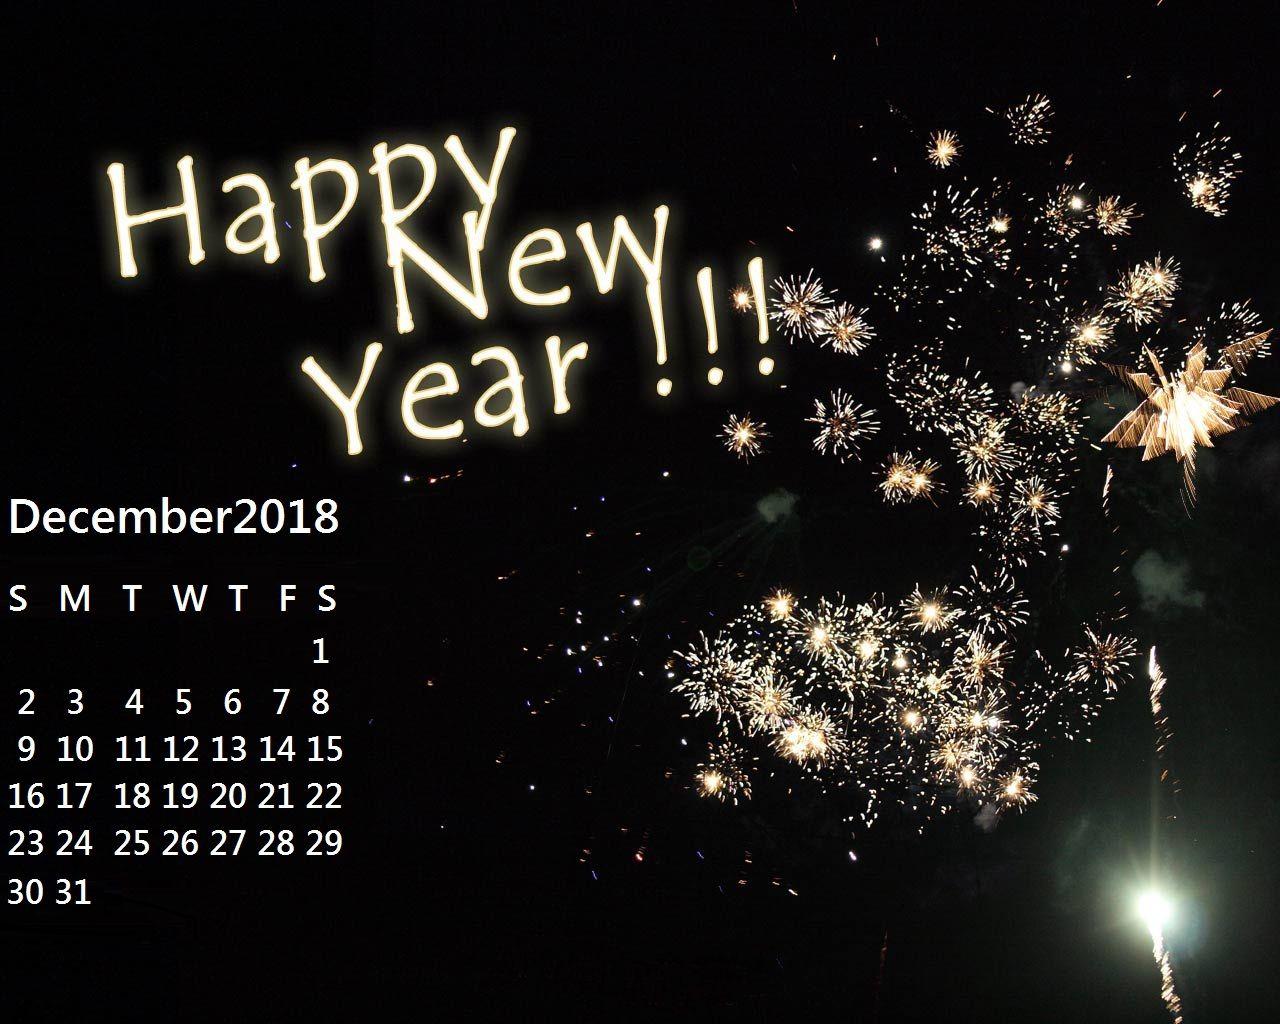 December 2018 New Year Celebration Desktop Wallpaper Calendar Wallpaper Calendar Wallpaper Desktop Calendar